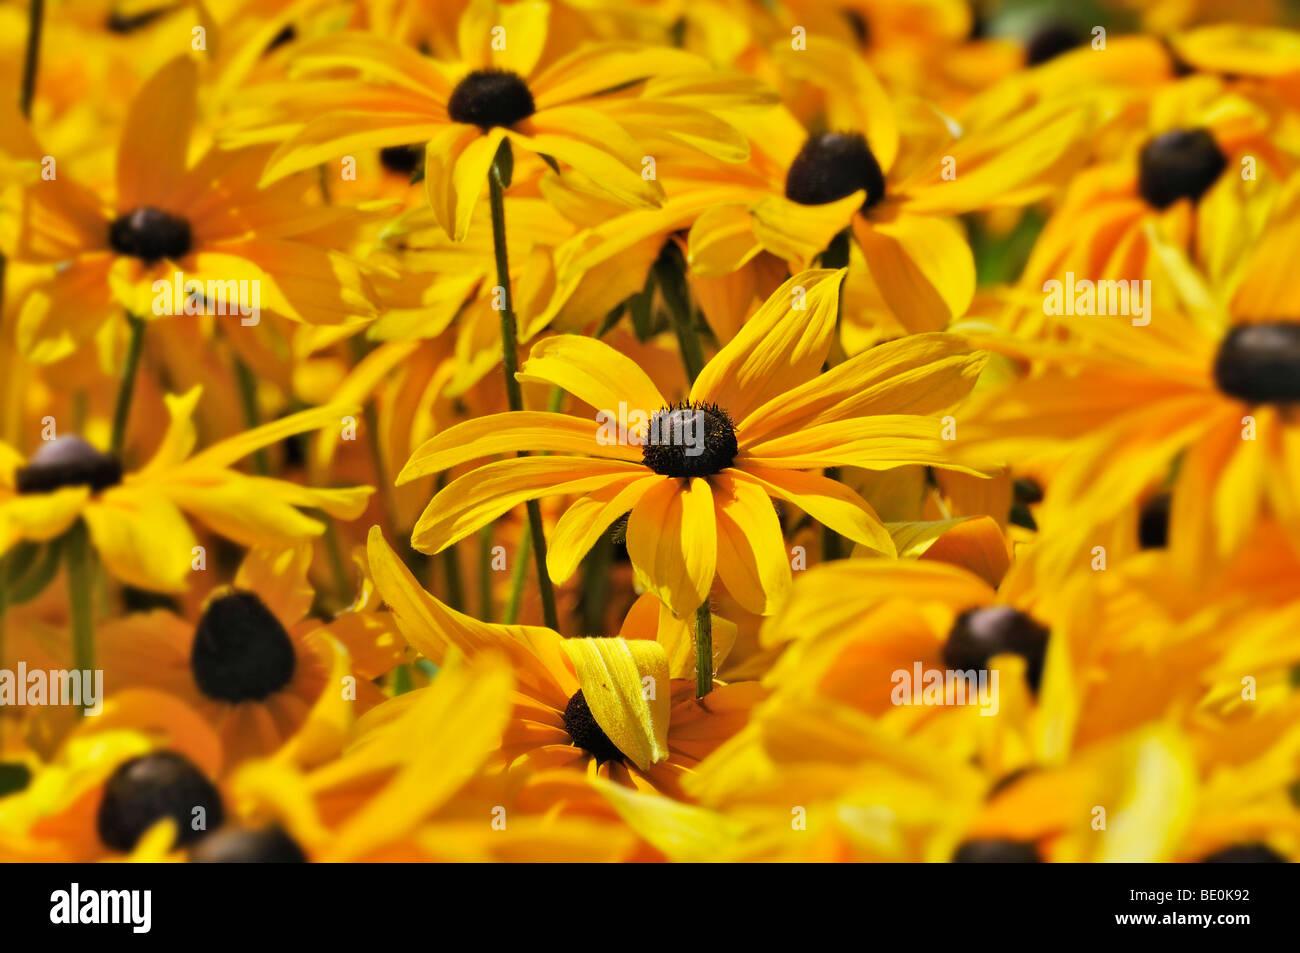 Coneflower (Rudbeckia) - Stock Image